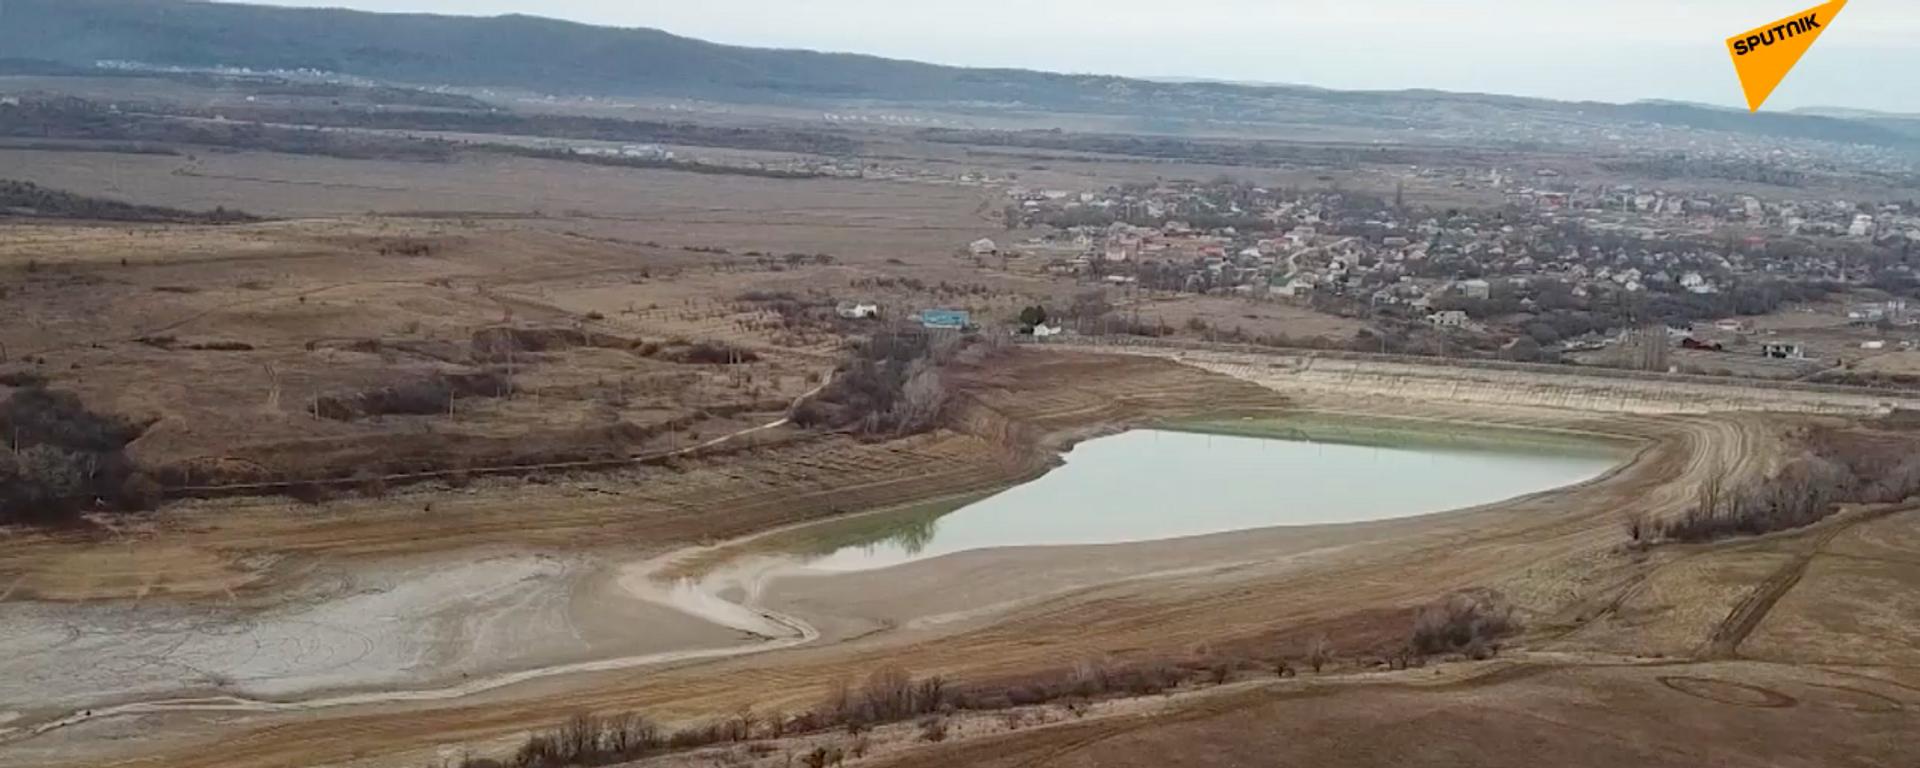 Na Krymie brakuje wody pitnej - Sputnik Polska, 1920, 15.01.2021